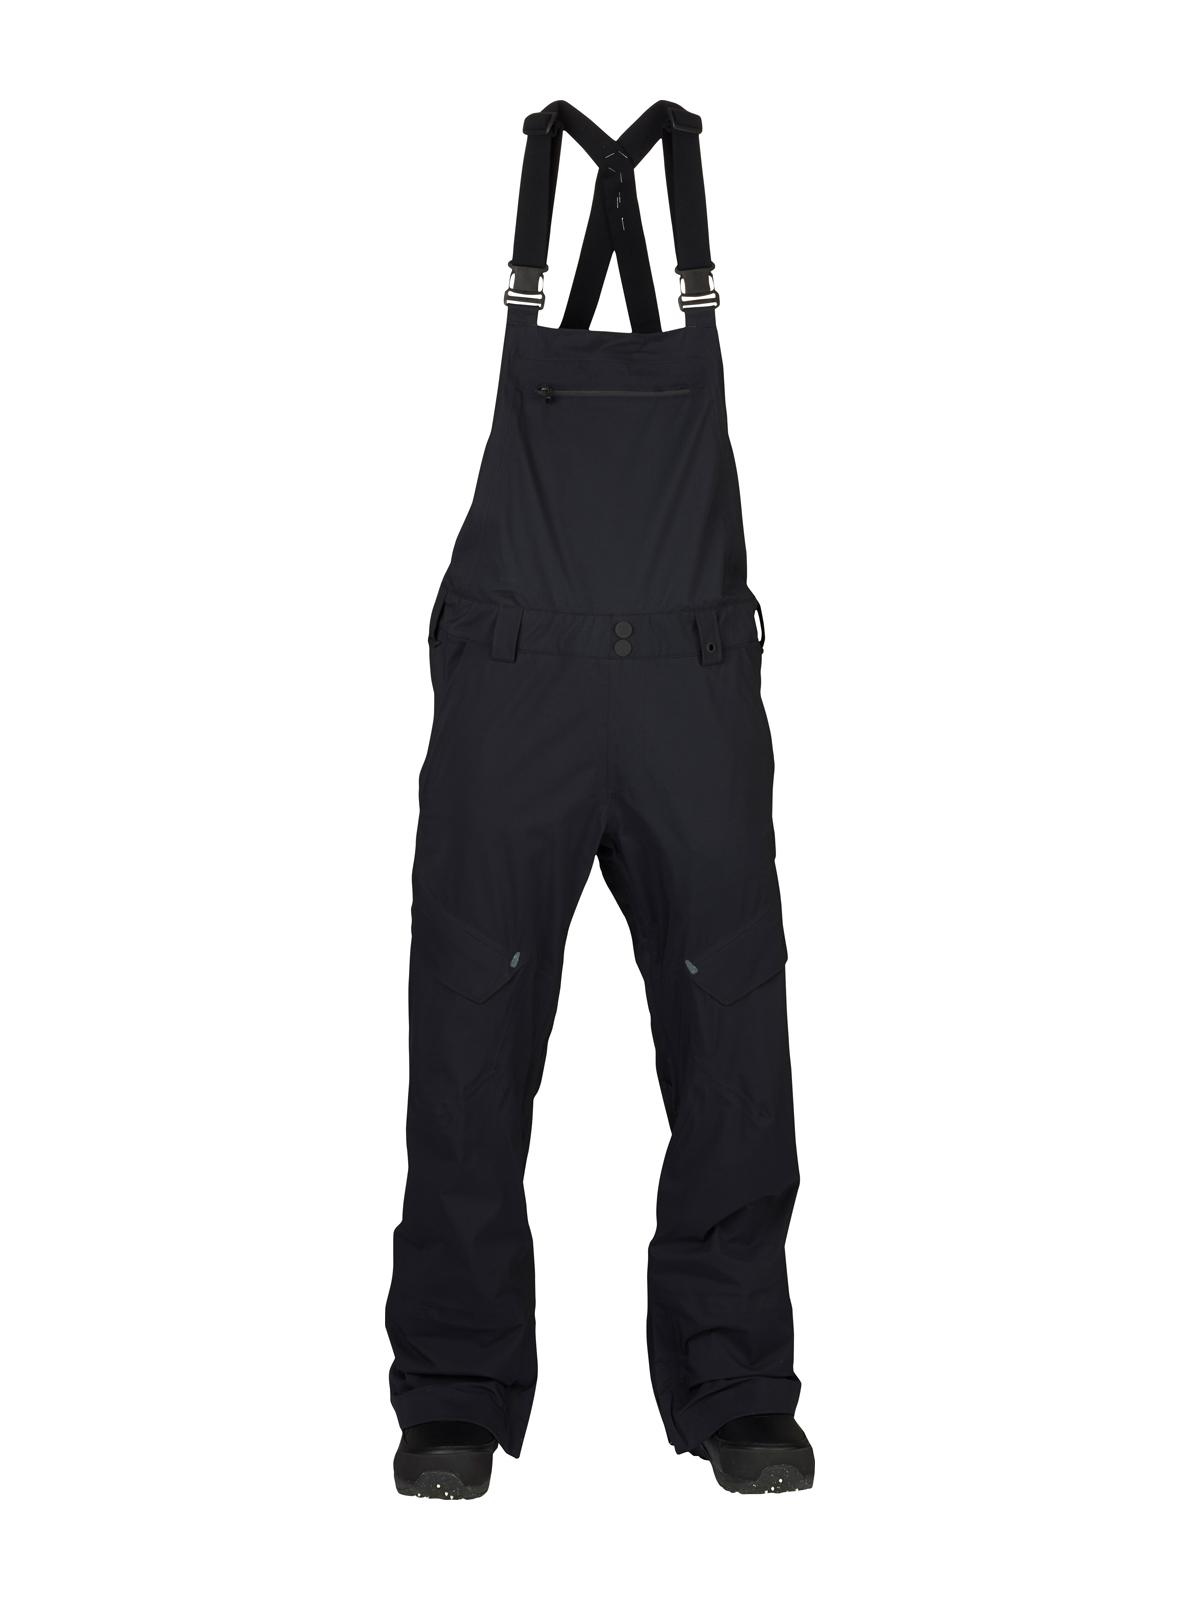 Spodnie Snowboardowe Burton 3l Prospect Bib (True Black)